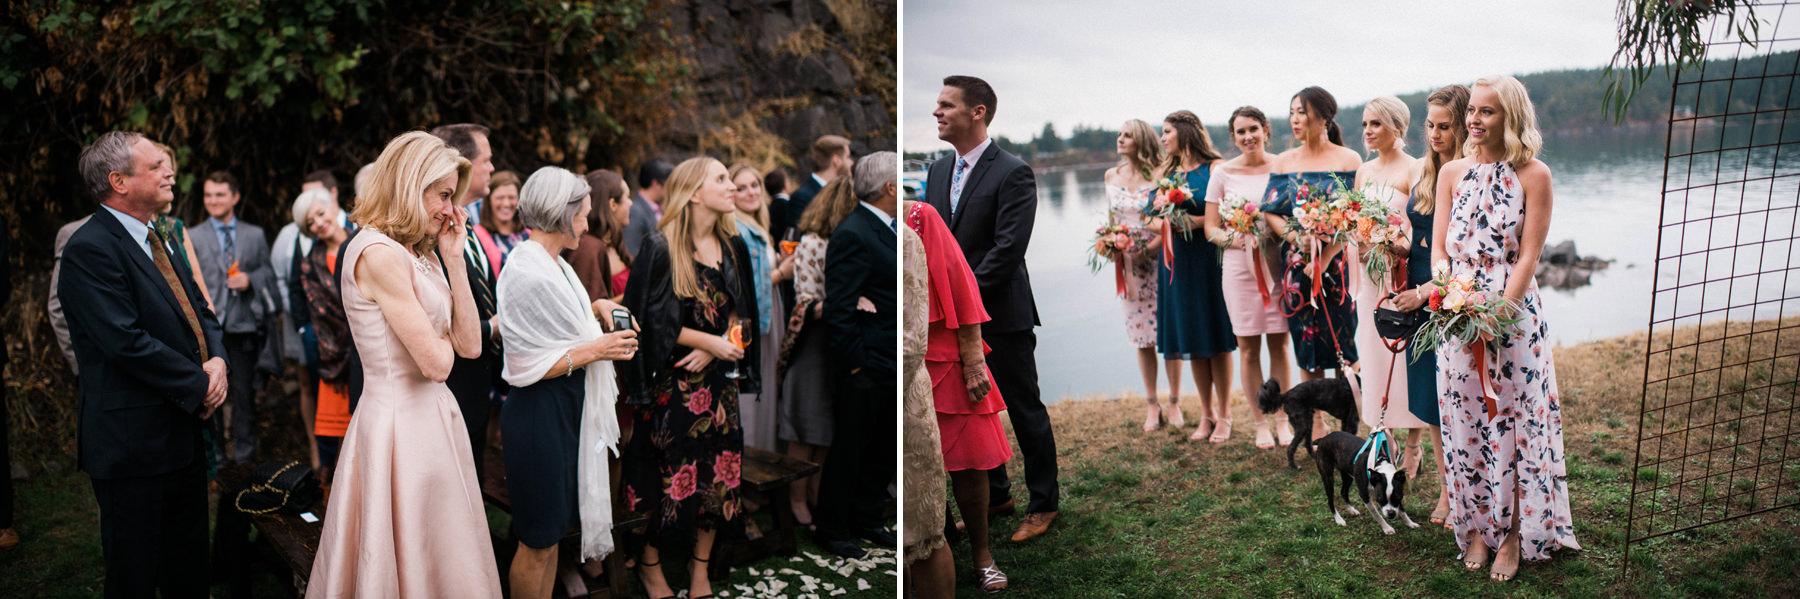 313-colorful-outdoor-lopez-island-wedding.jpg